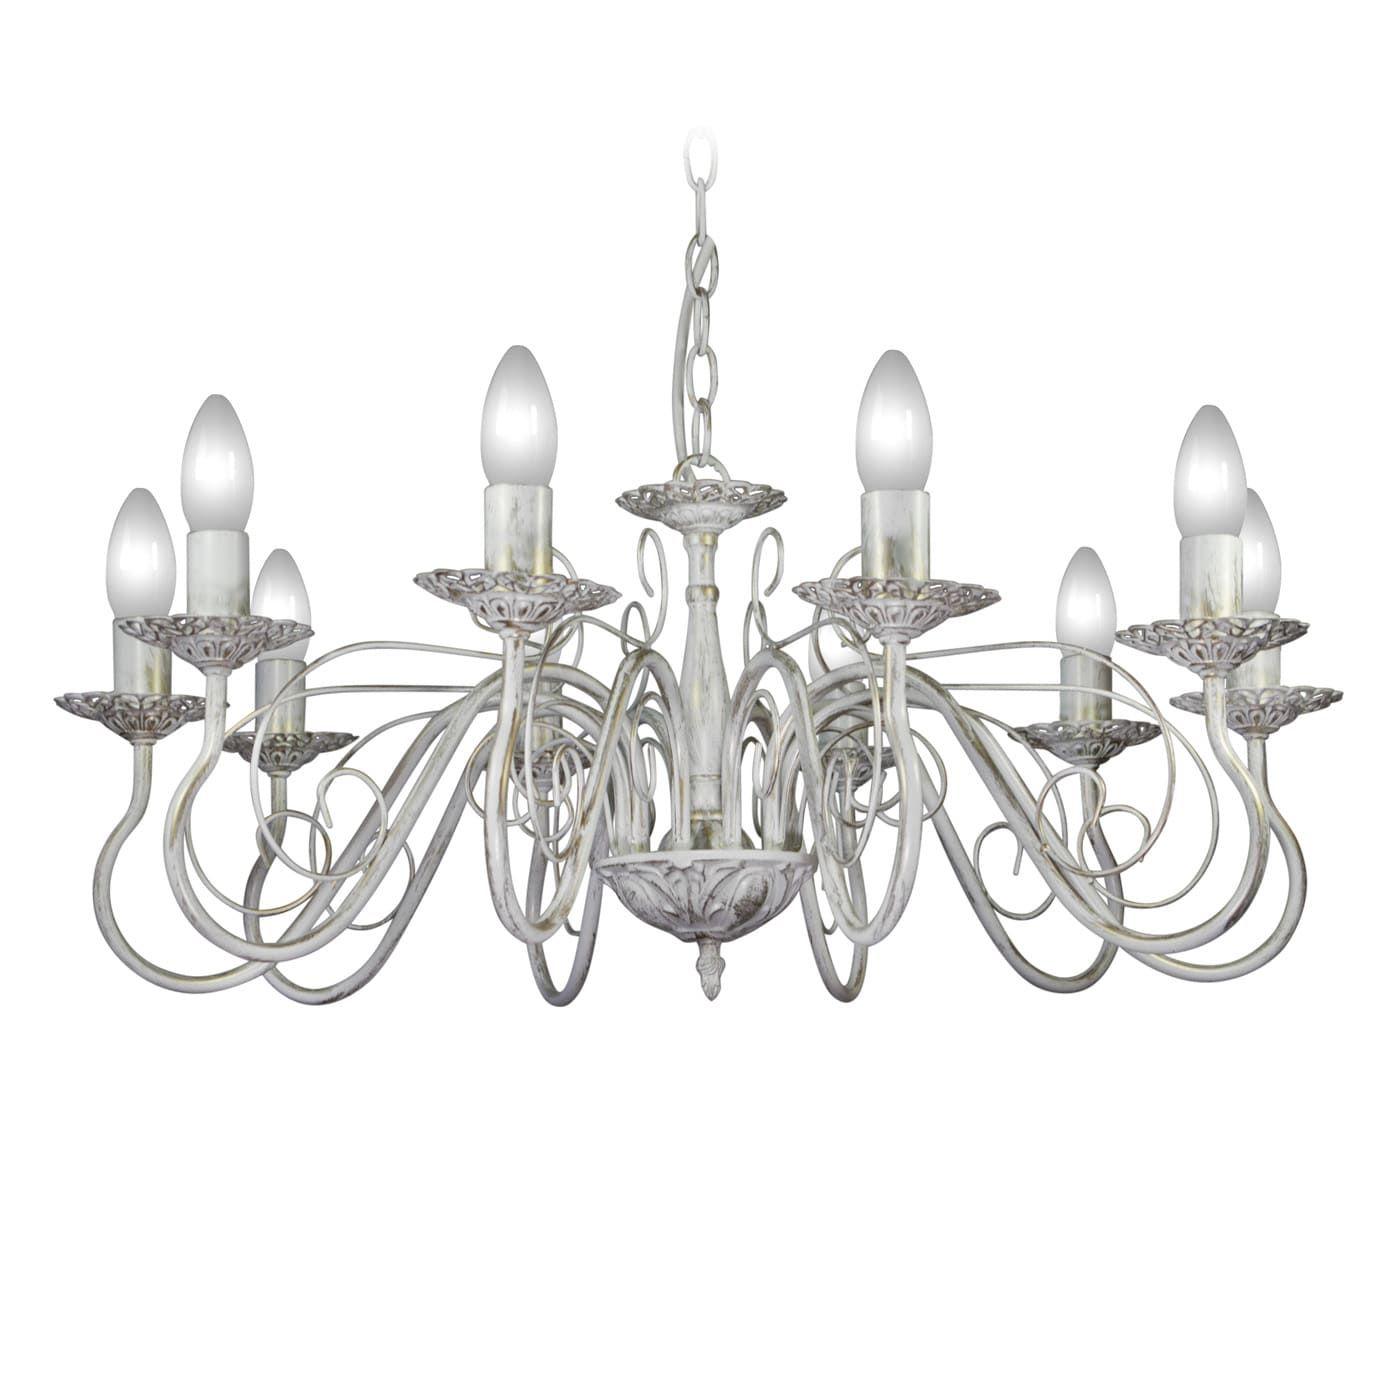 PETRASVET / Pendant chandelier S1164-10, 10xE14 max. 60W